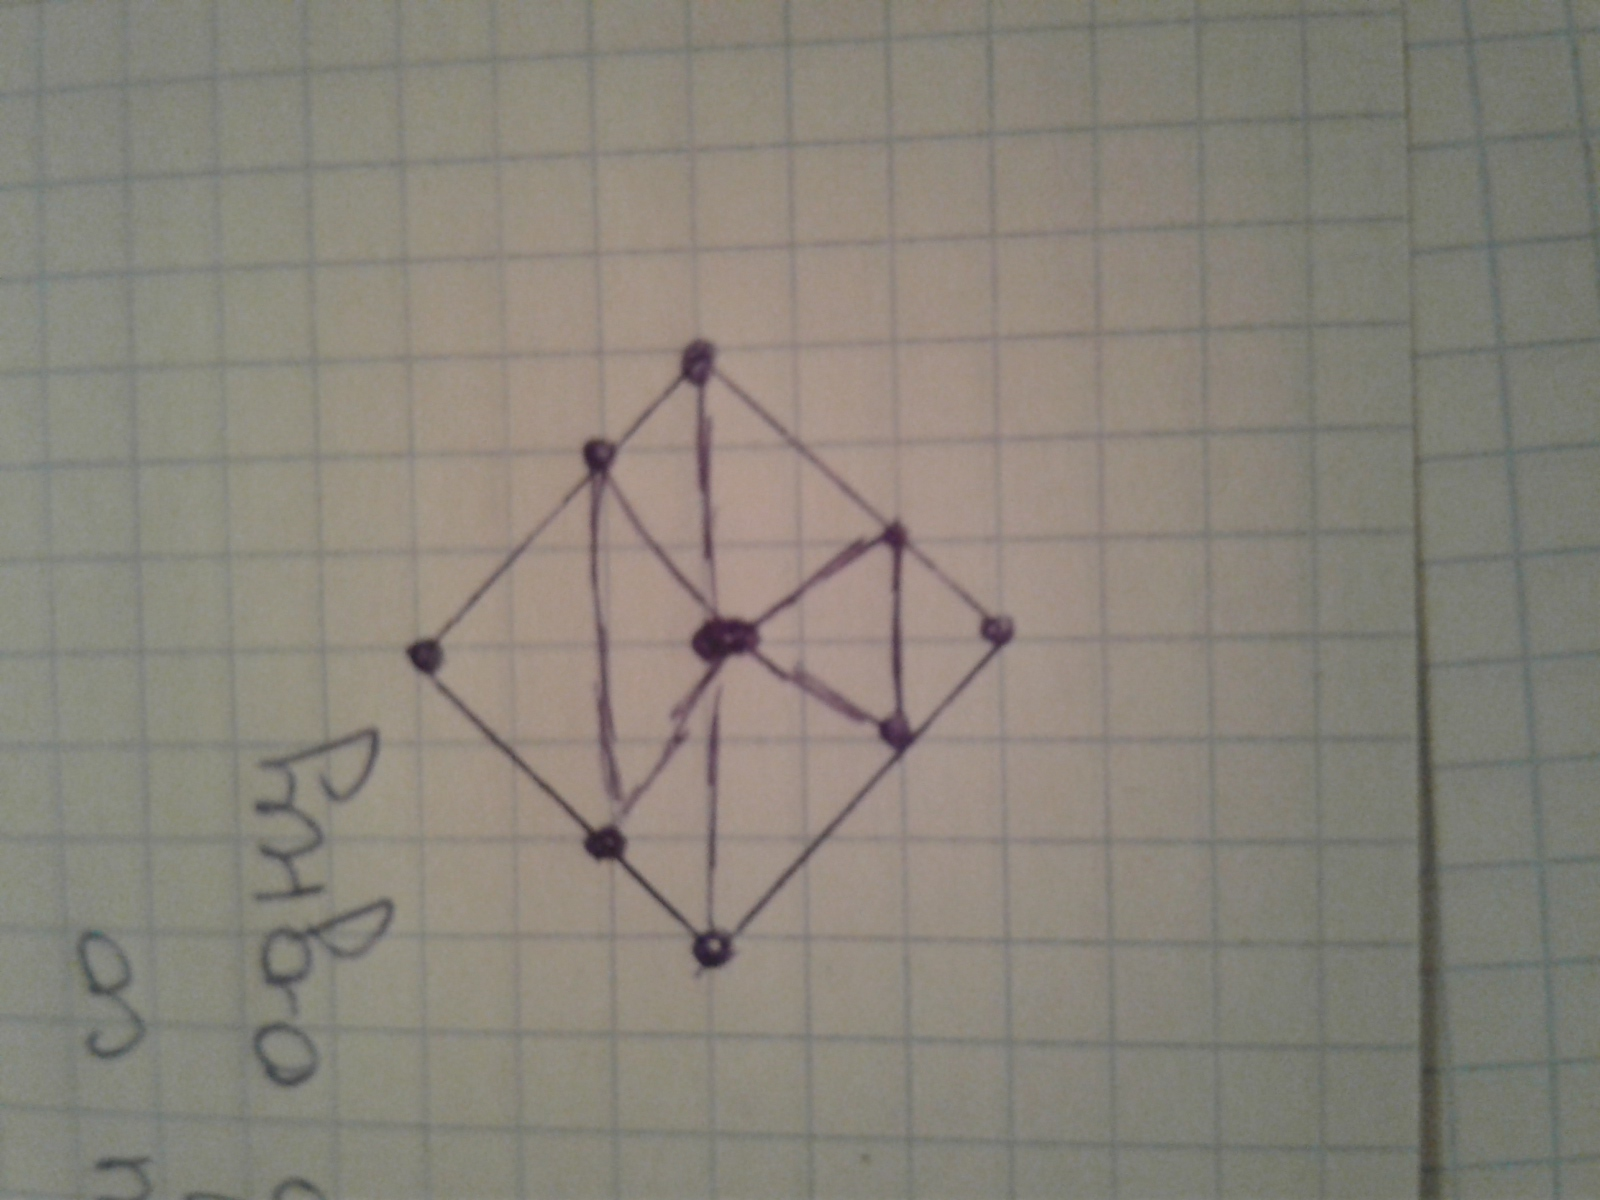 Задачи со спичками Задачи и головоломки 52